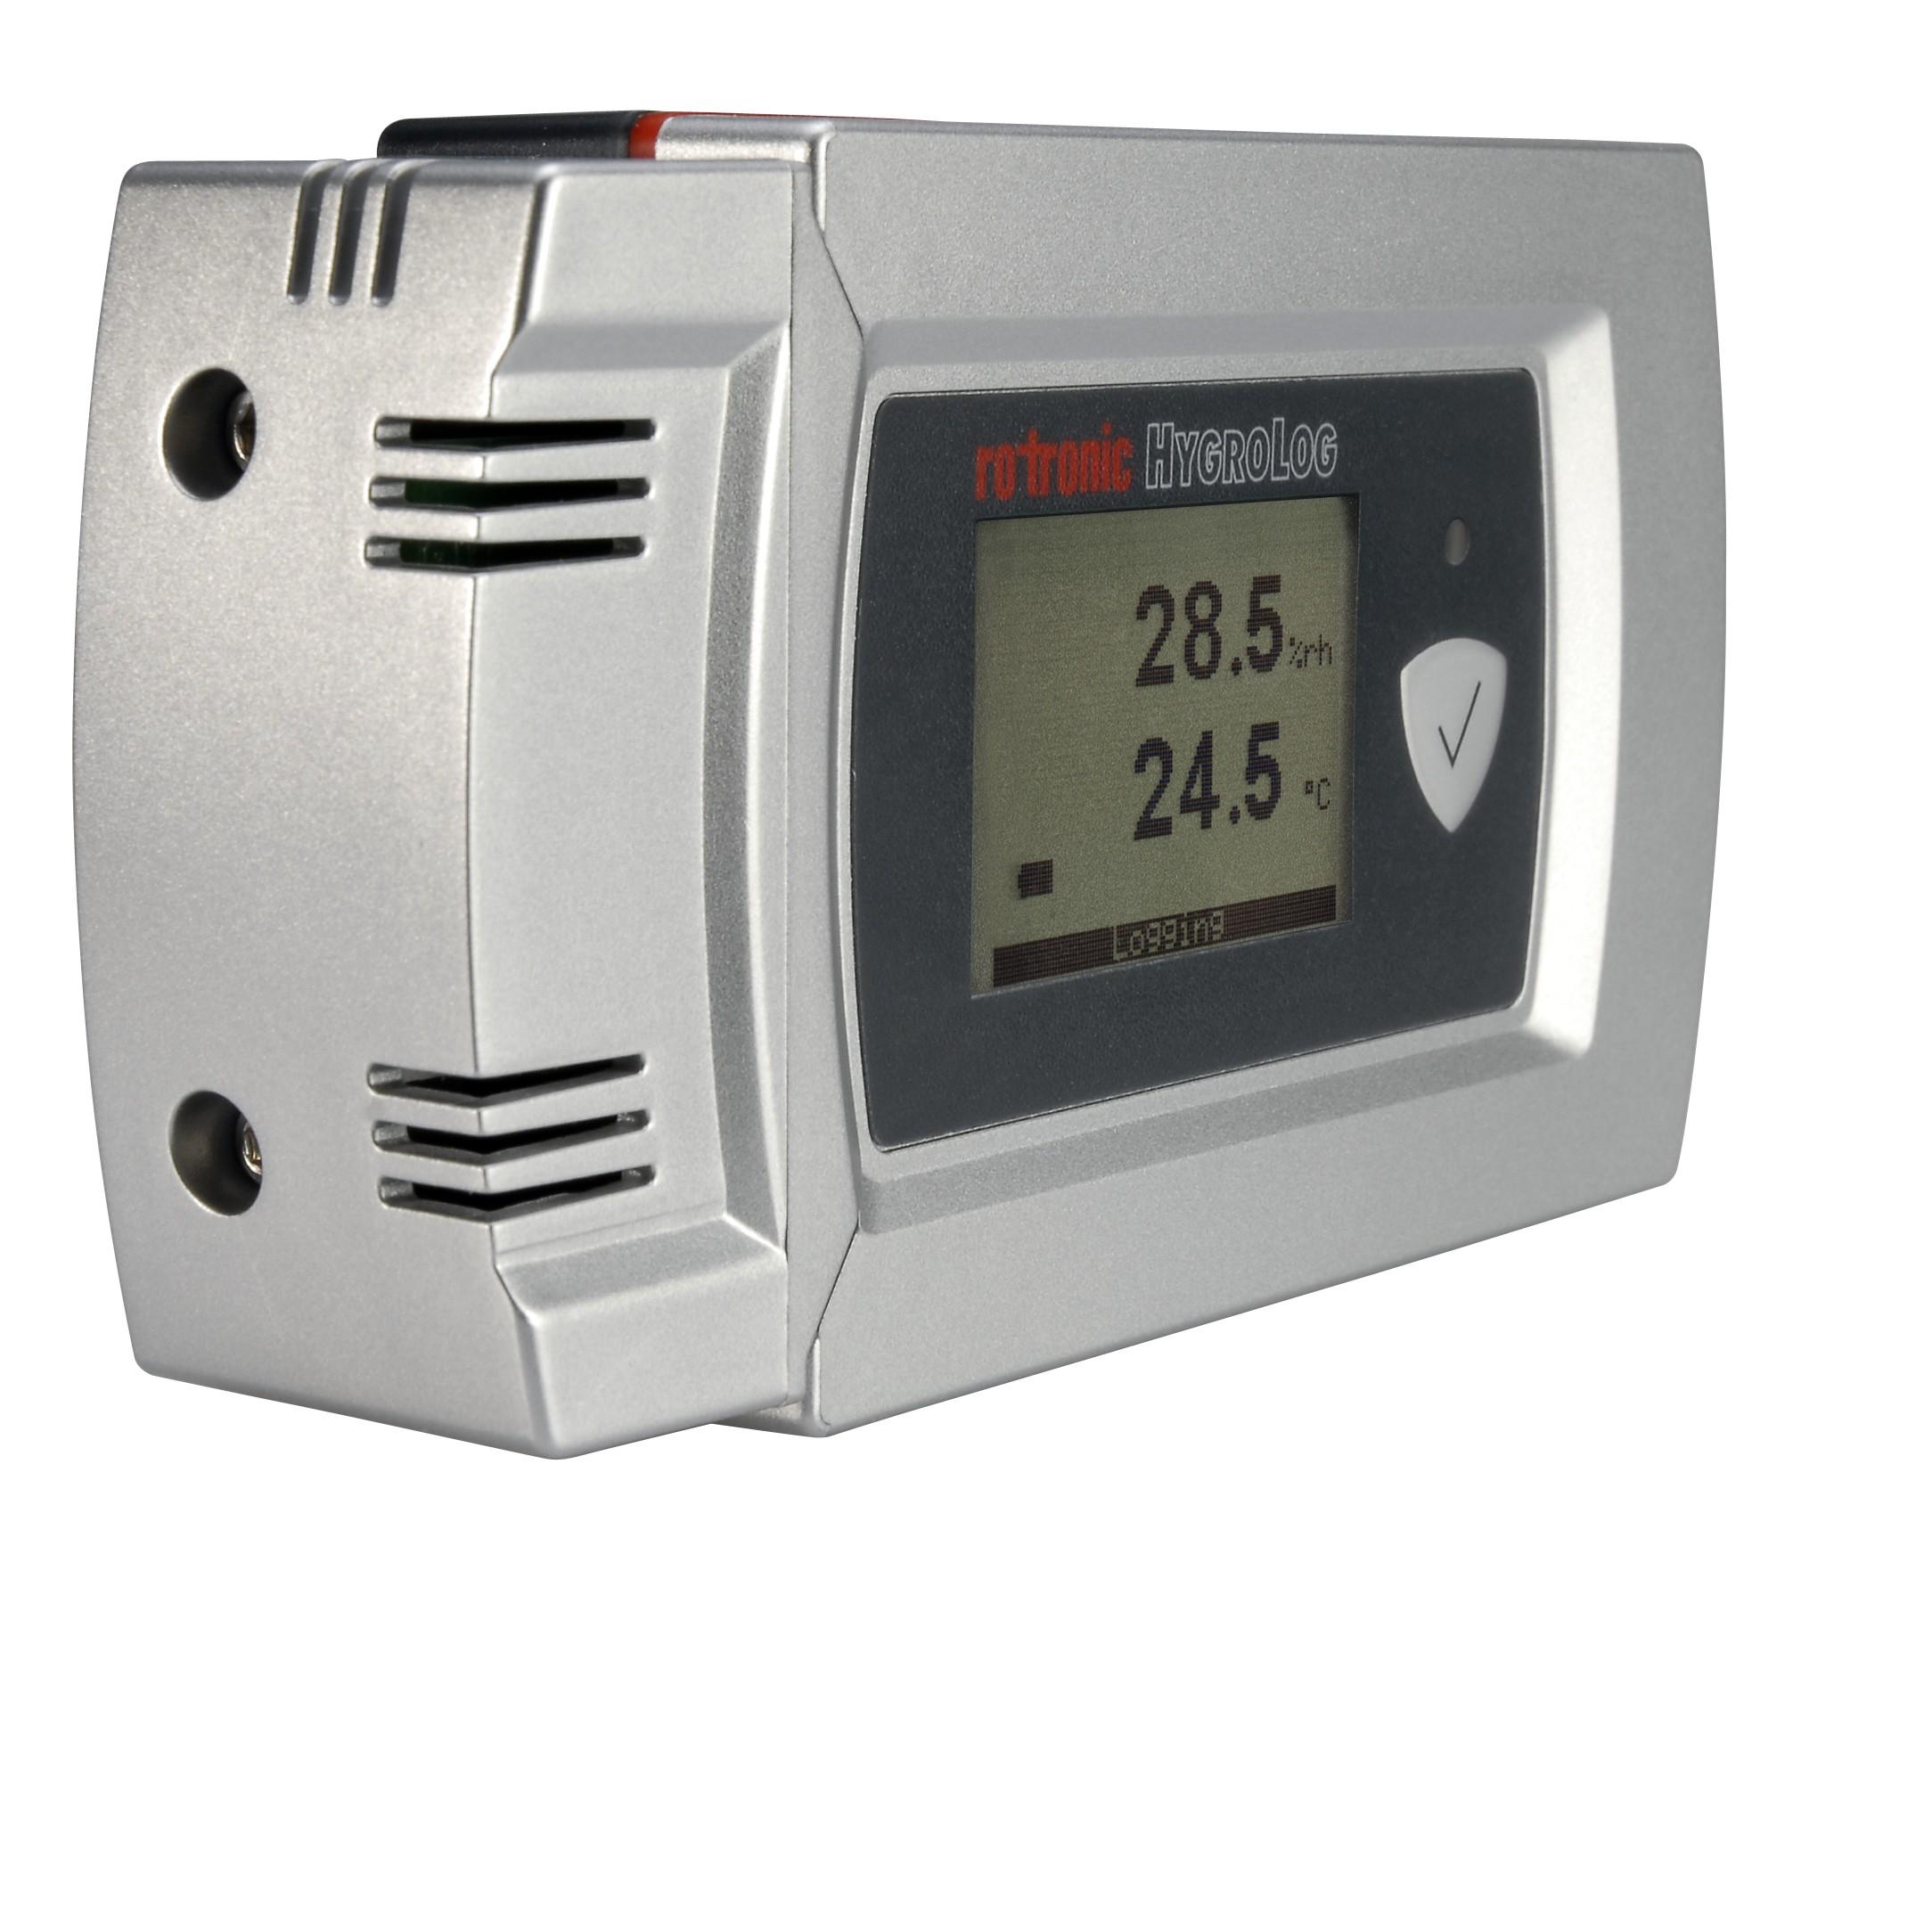 HYGROLOG HL-20D 紧凑型数据记录器(Rotronic(罗卓尼克))